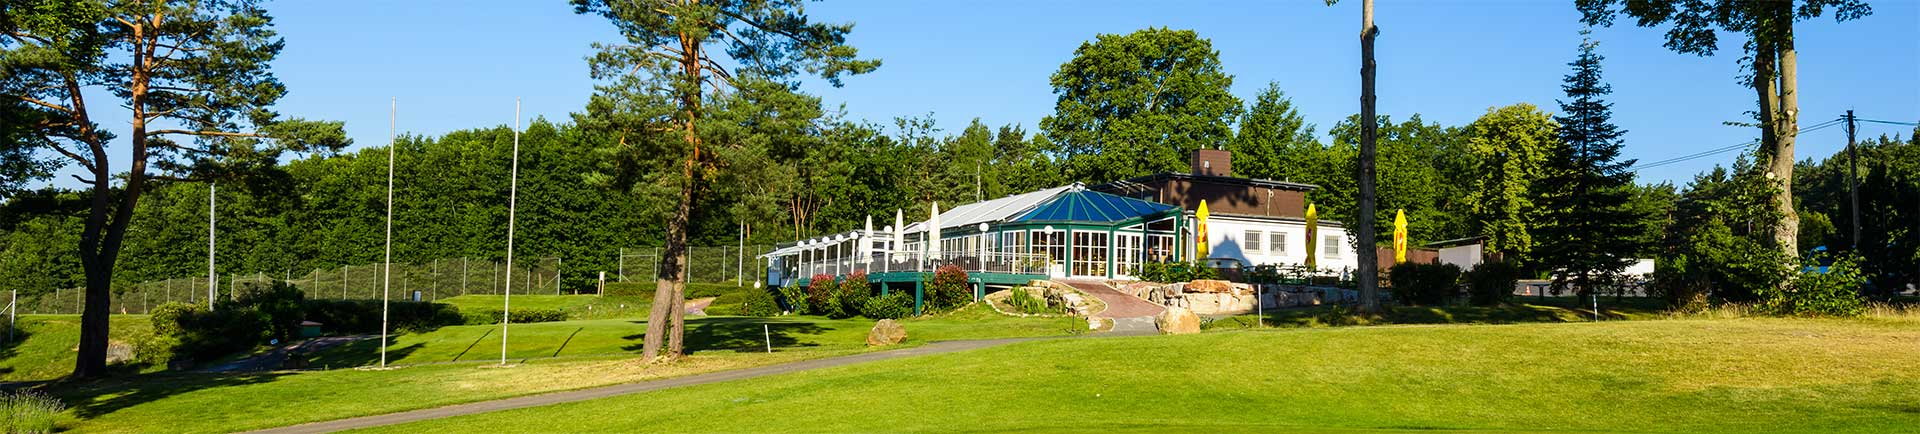 rheinblick-golfcourse-19